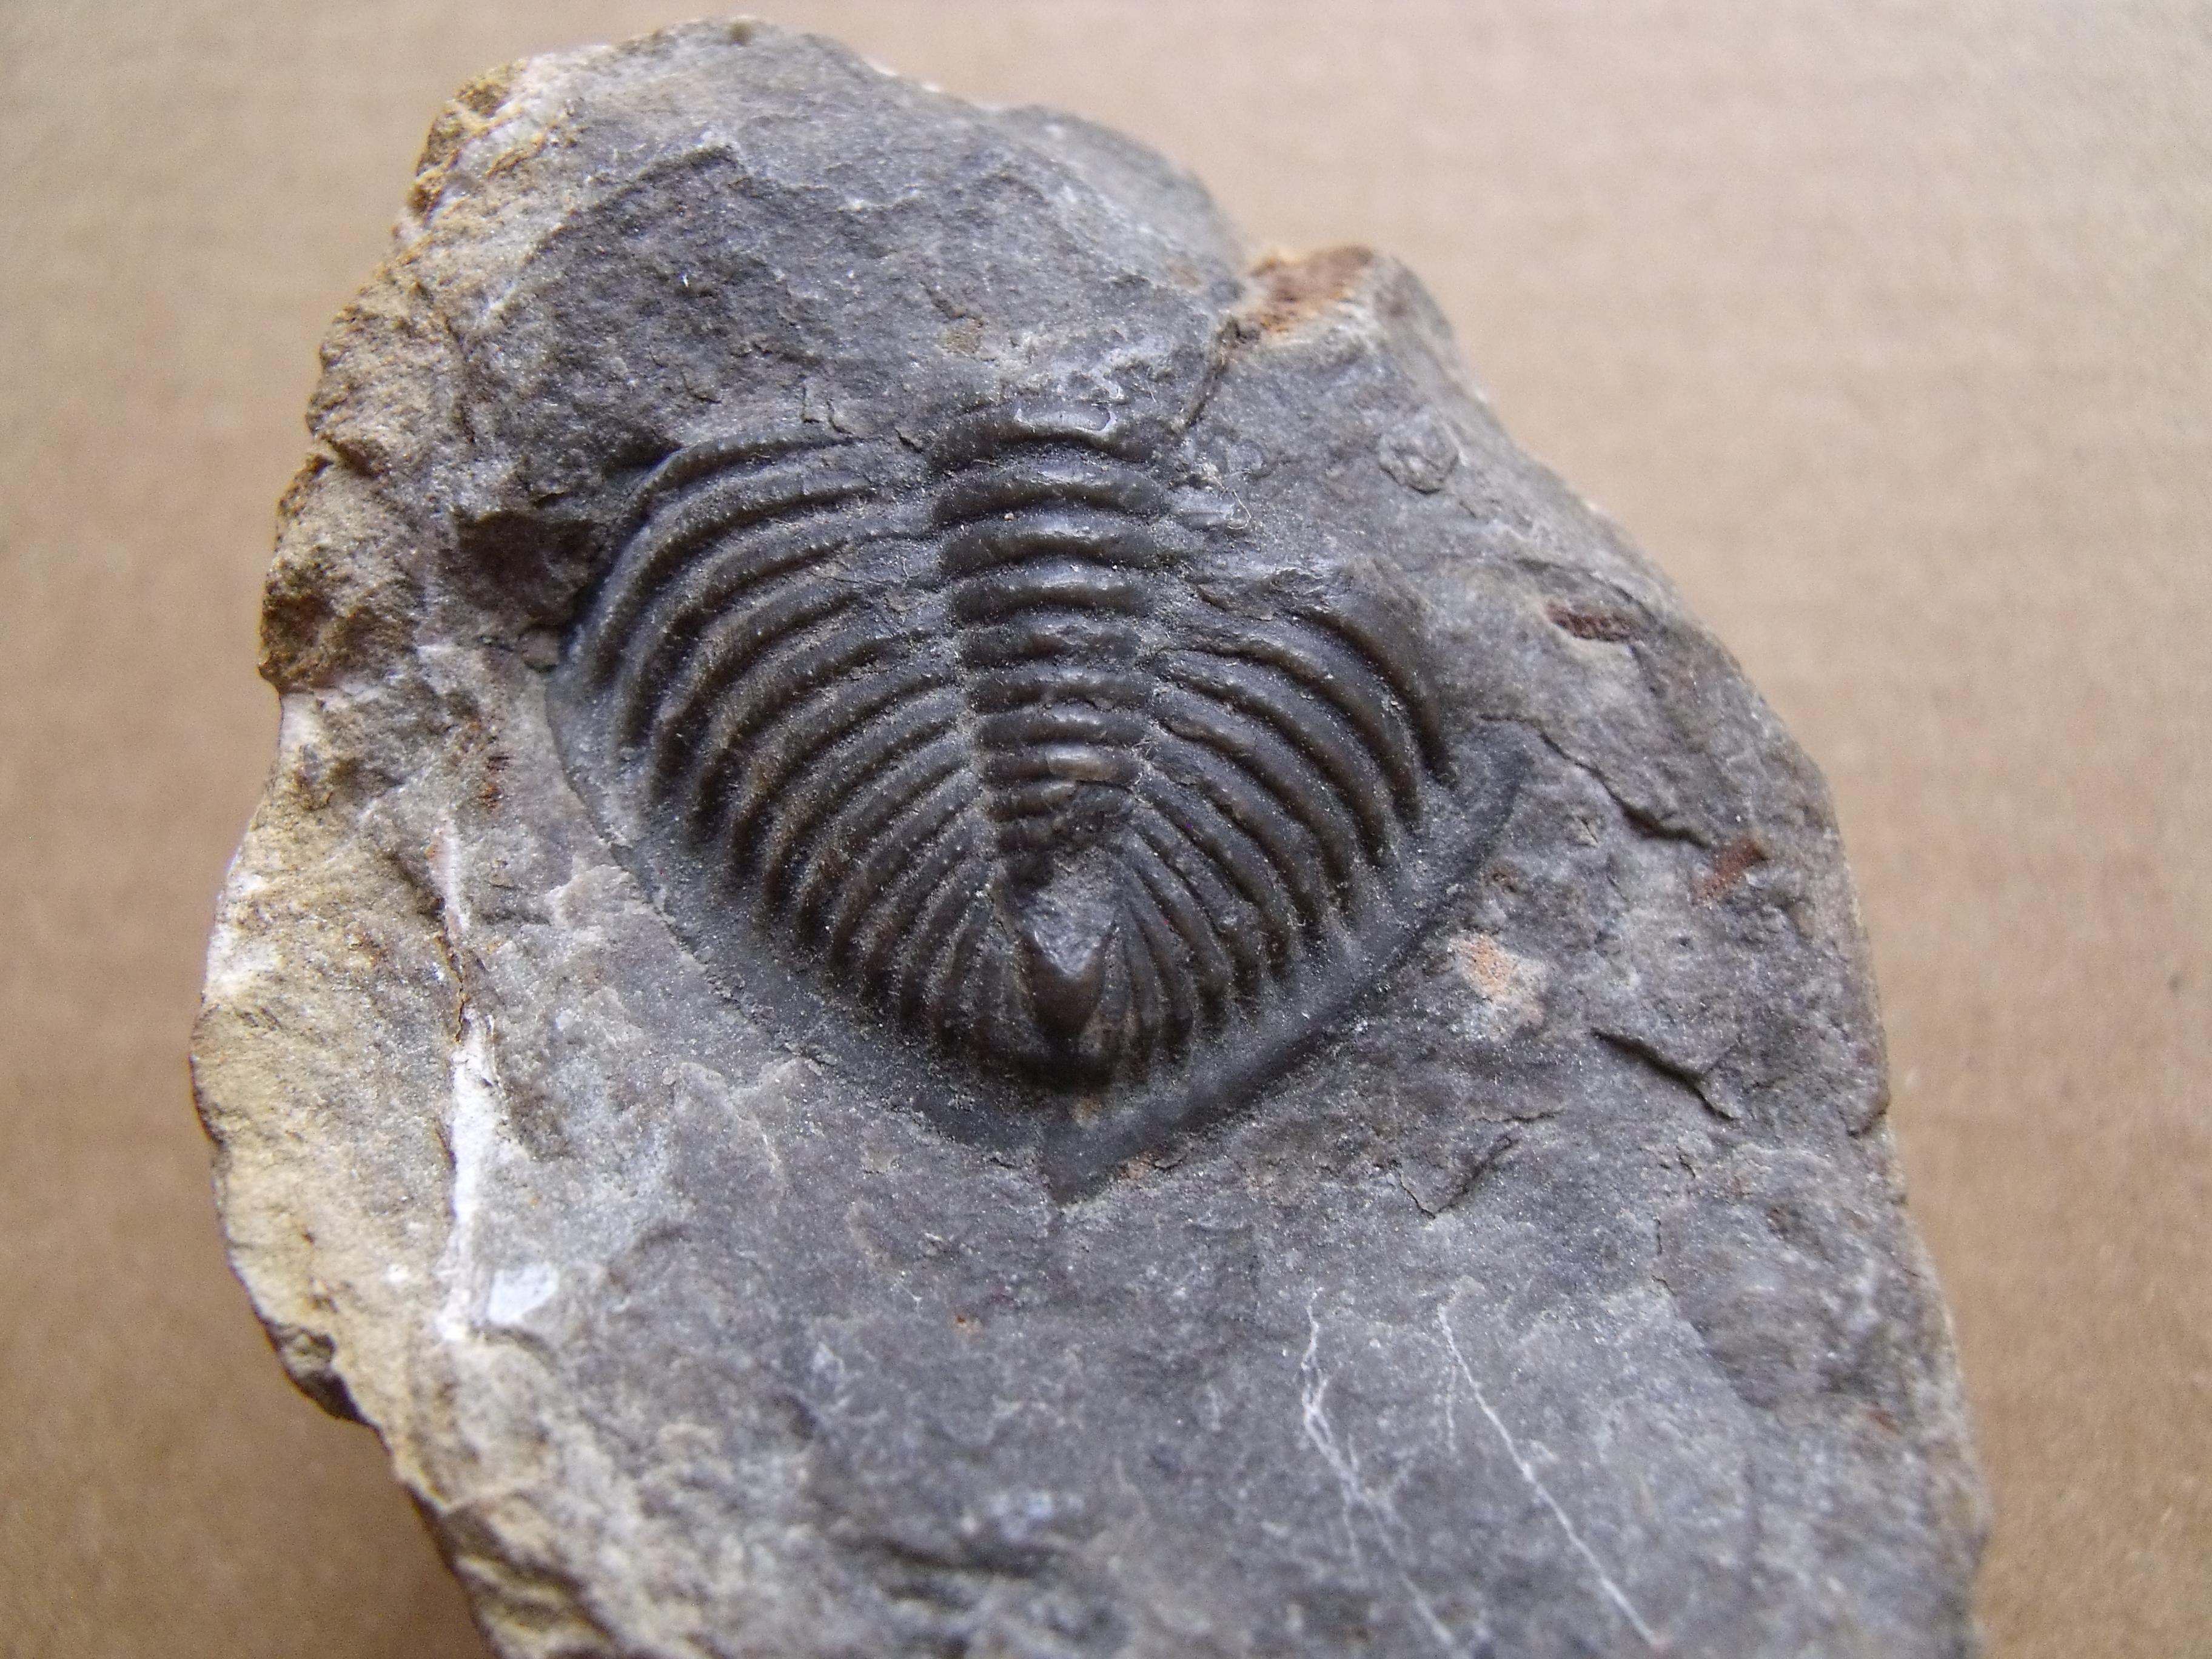 ocasní štít trilobita Odontochyle hausmanni, (lok. Praha)